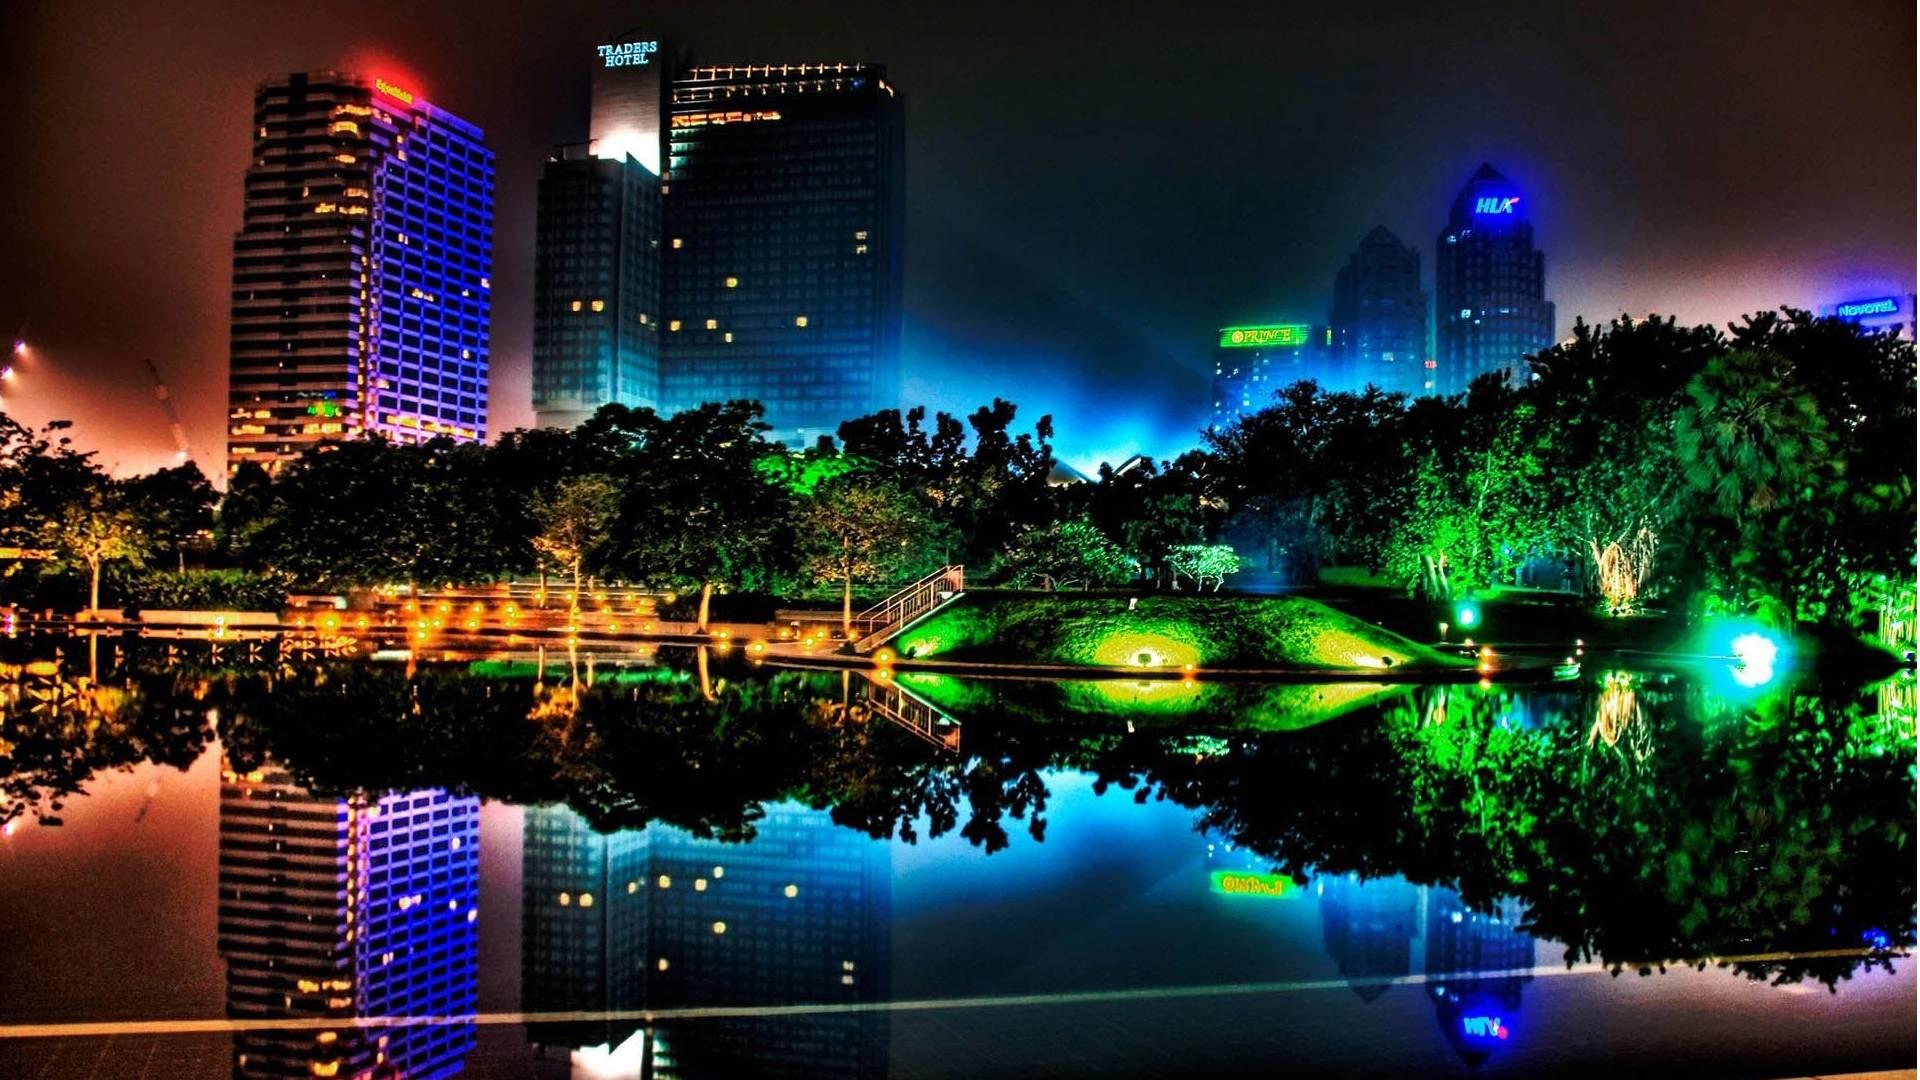 Hd wallpaper night - Wallpapers For Night City Wallpaper Desktop